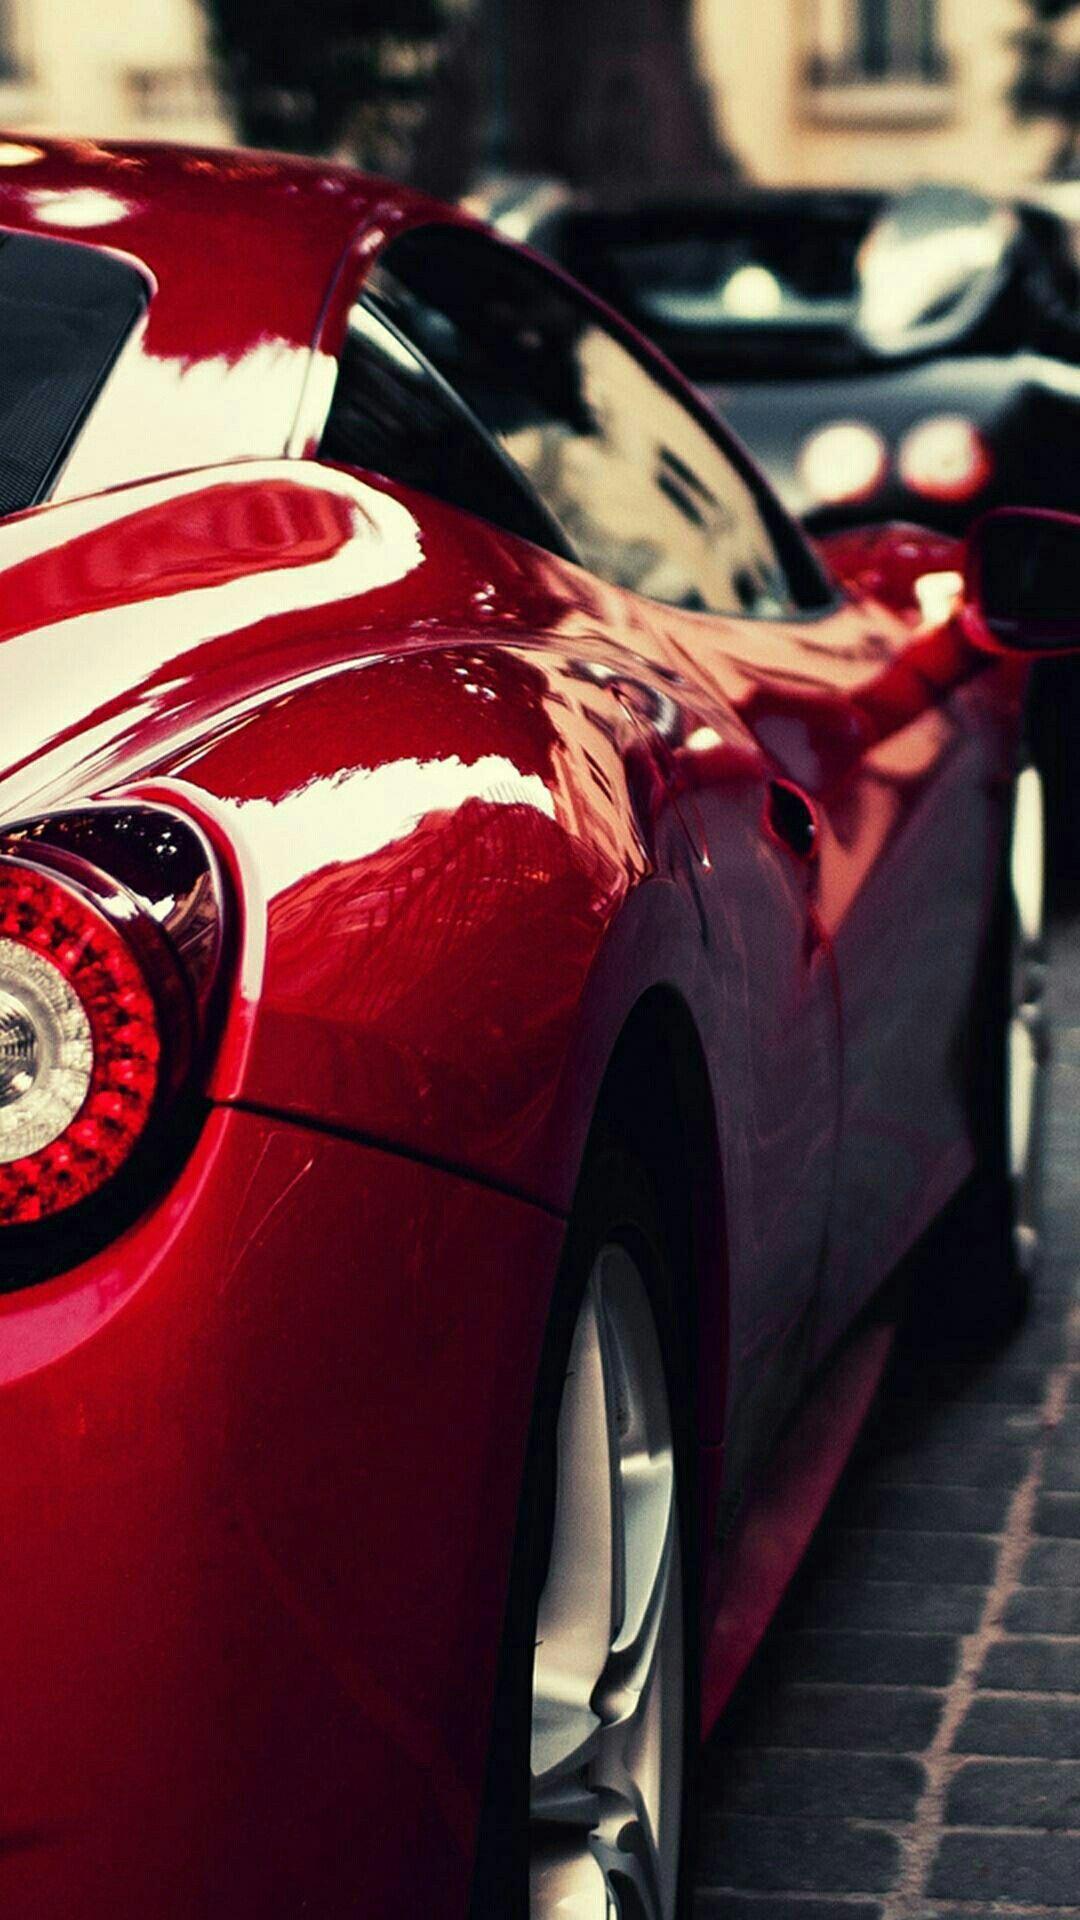 Ferrari Wallpaper Full Hd Car Wallpapers 1080p Free